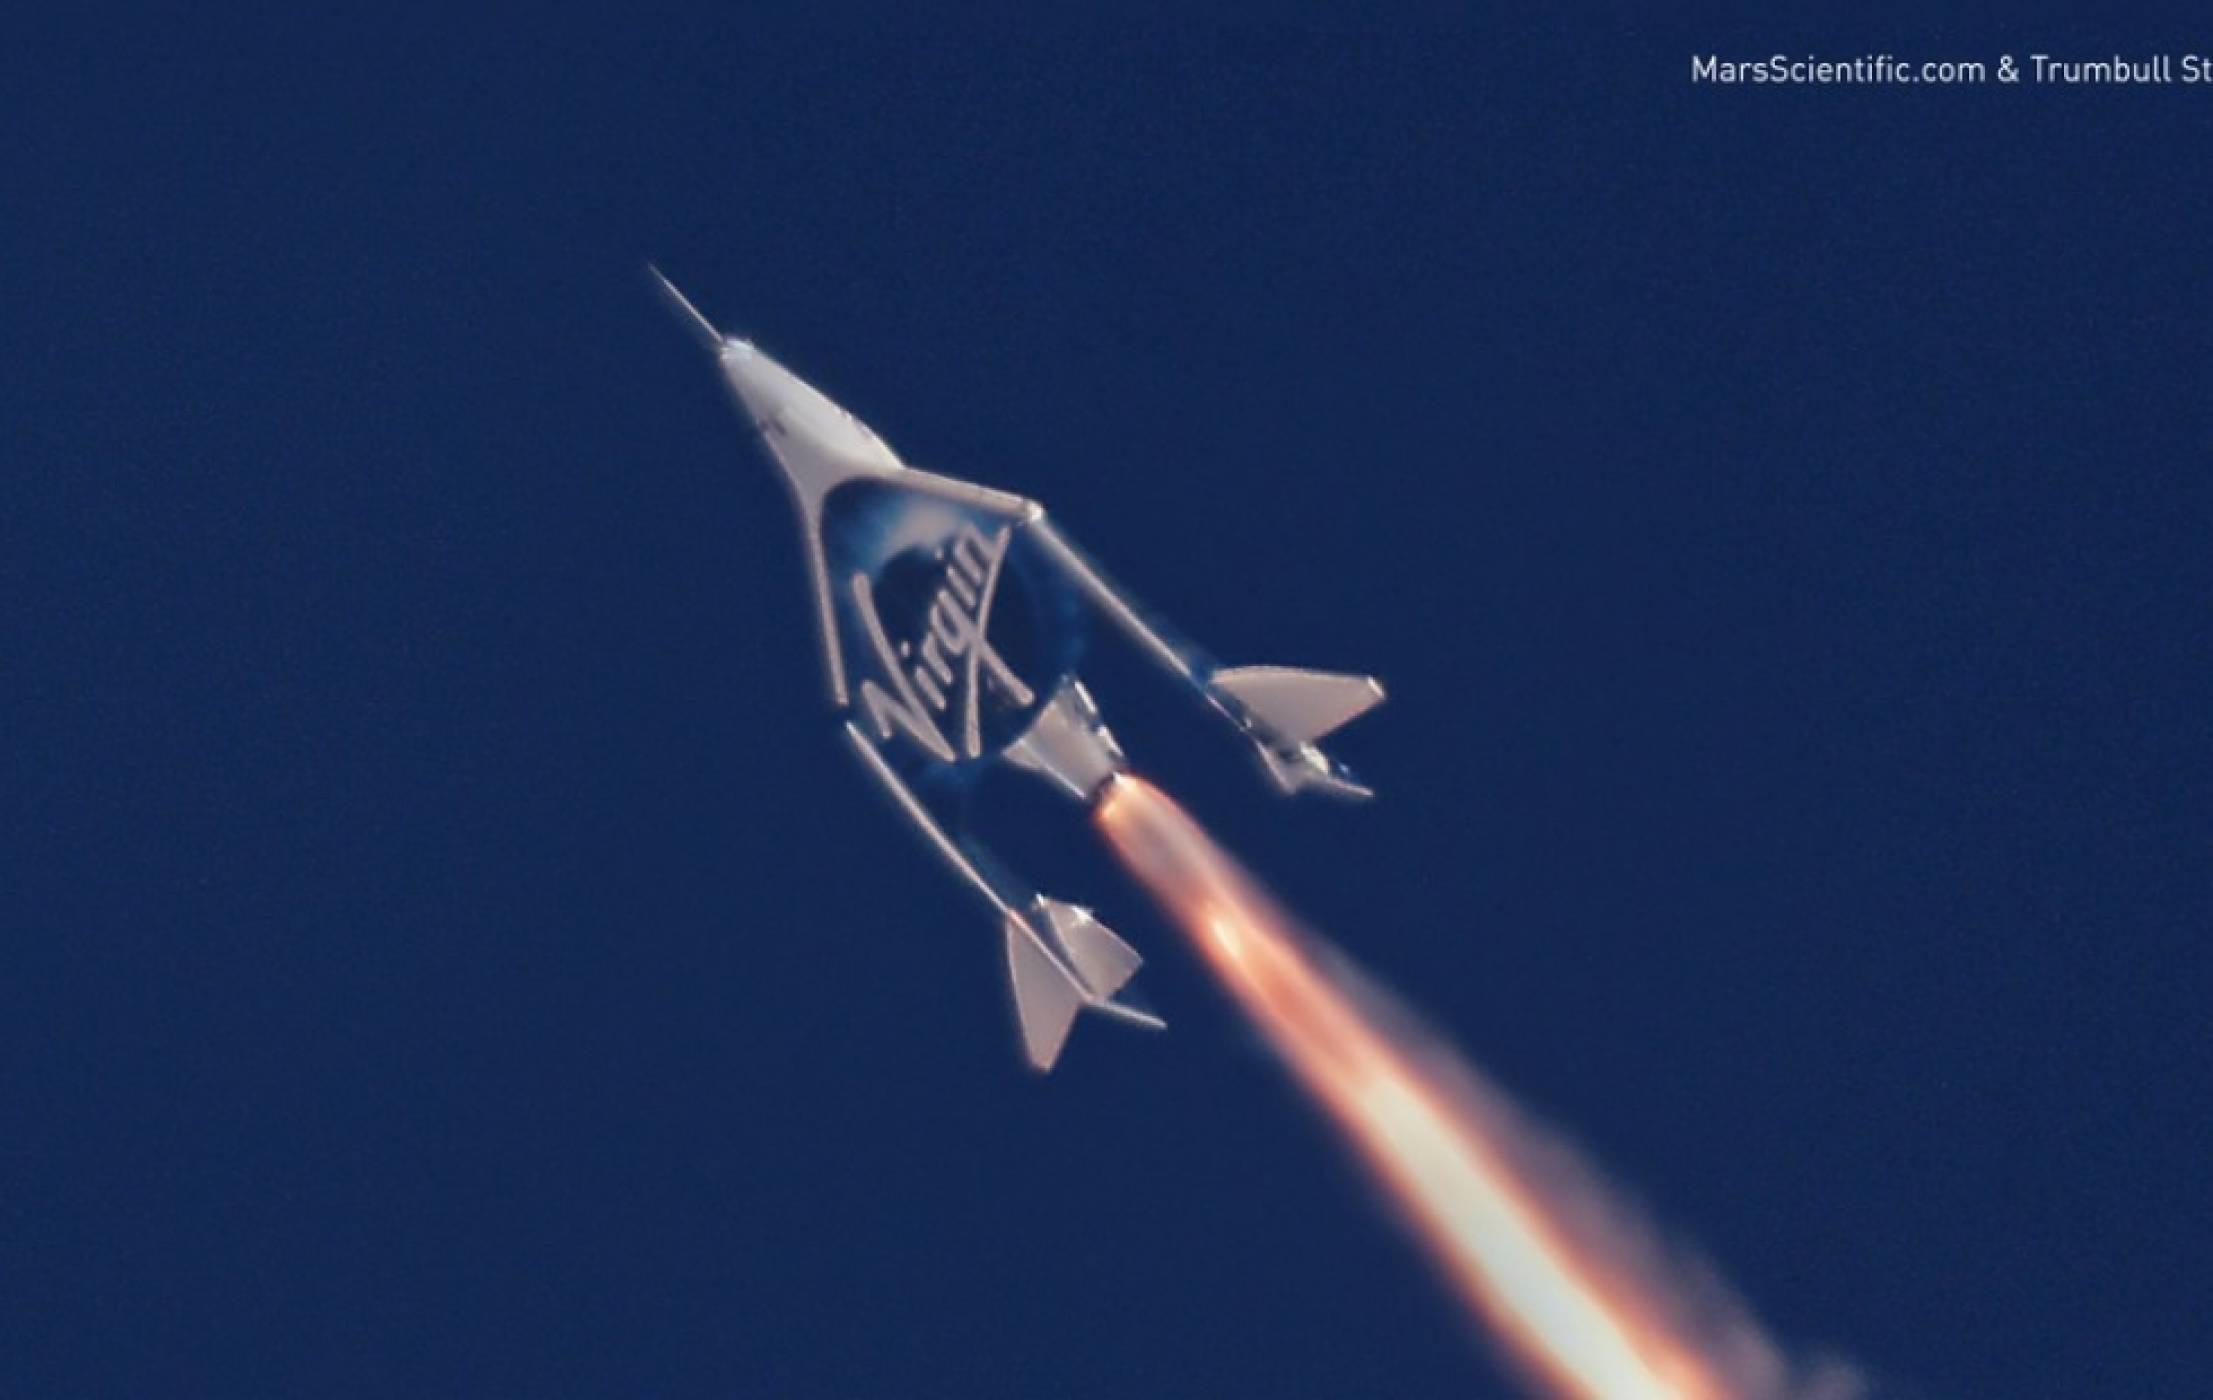 Virgin Galactic изпълни успешно втори свръхзвуков полет